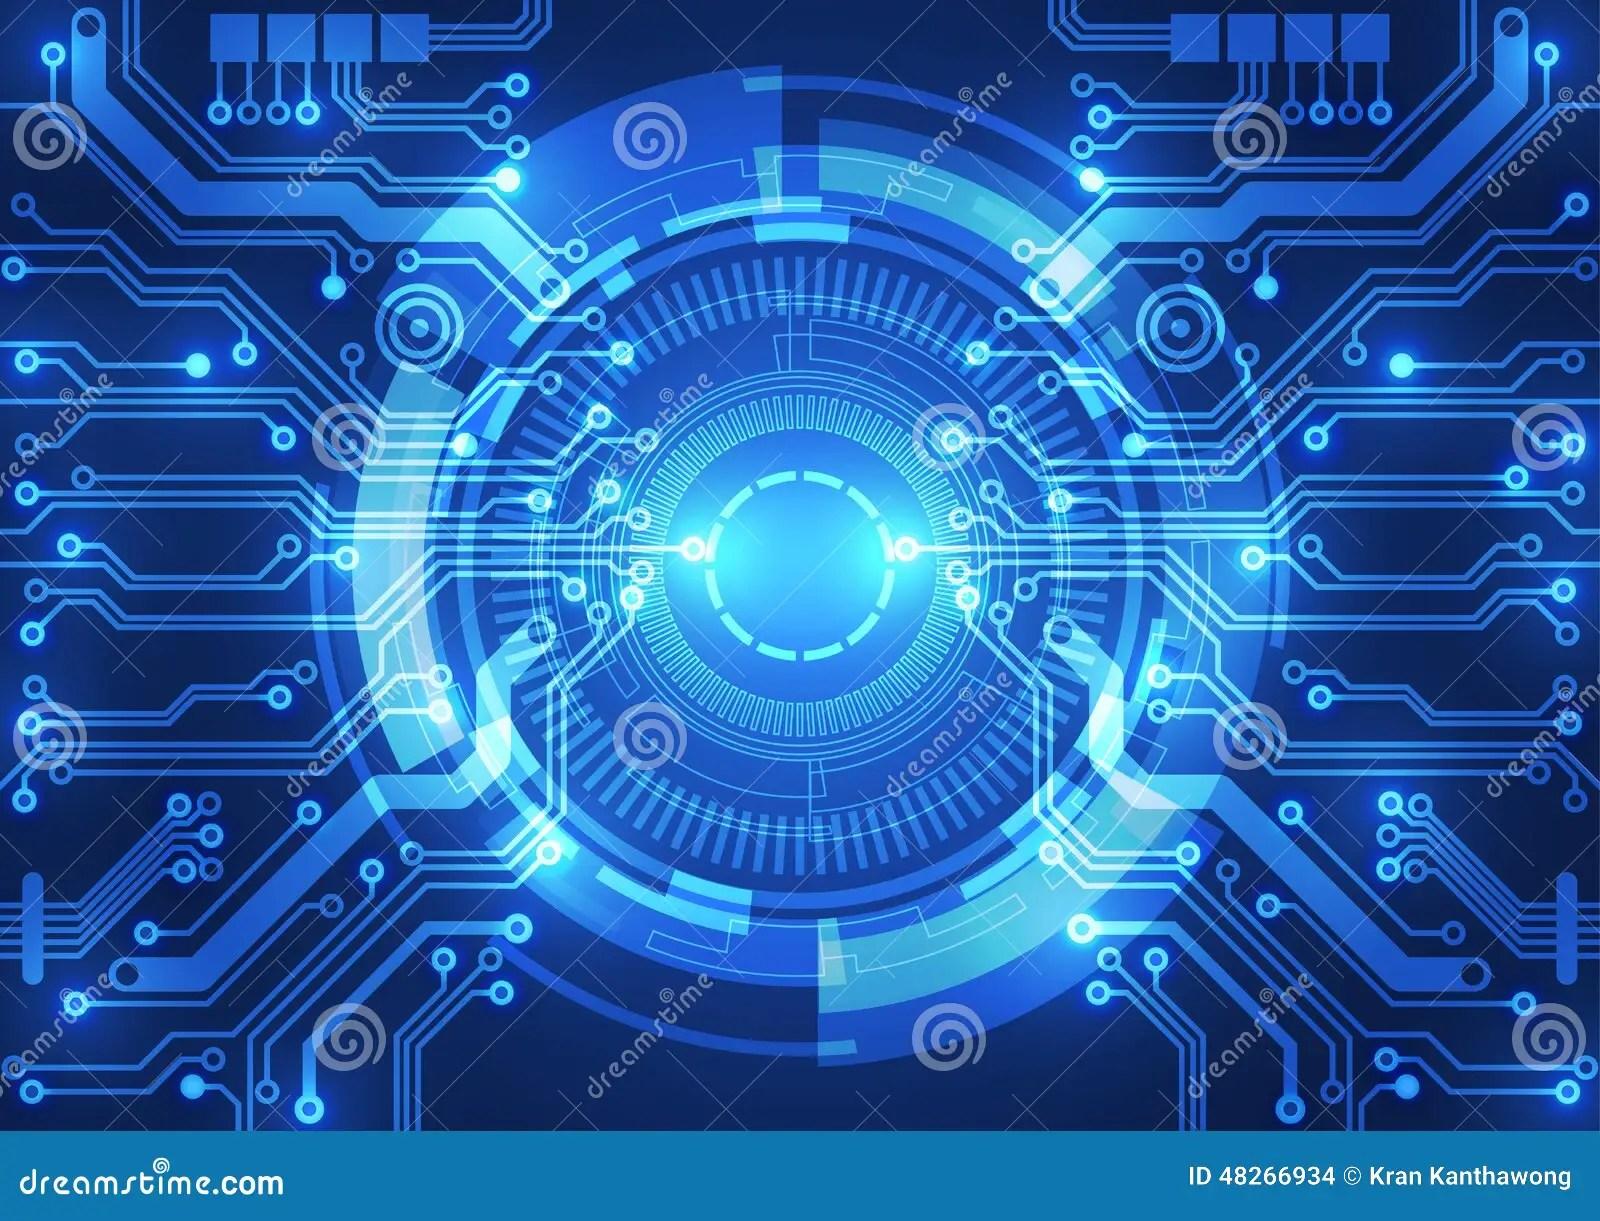 3d Digital Clock Wallpaper Fond Abstrait De Vecteur Style Futuriste De Technologie